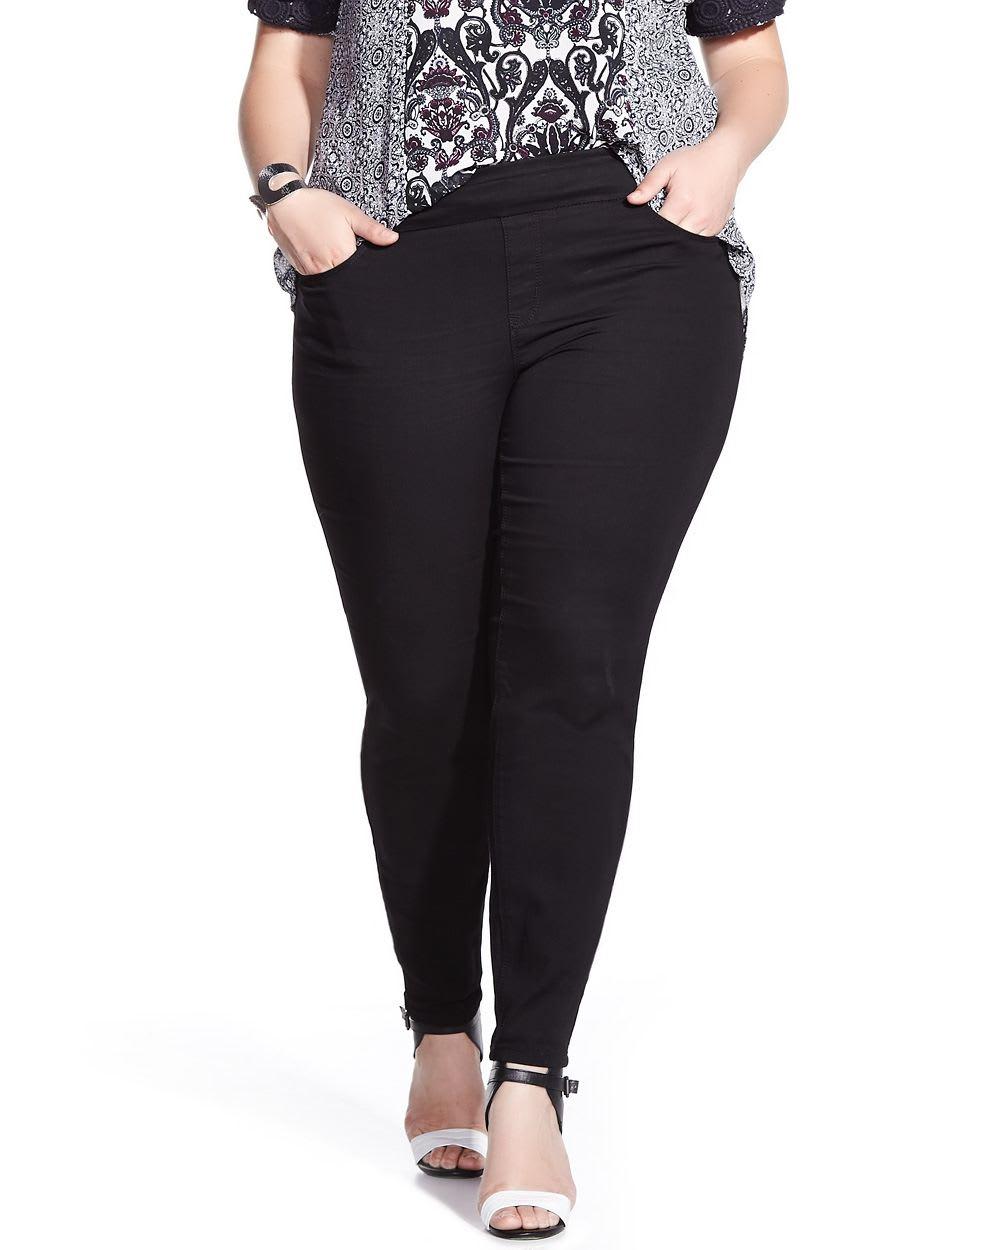 Plus Size Jean Leggings - Jeans Am